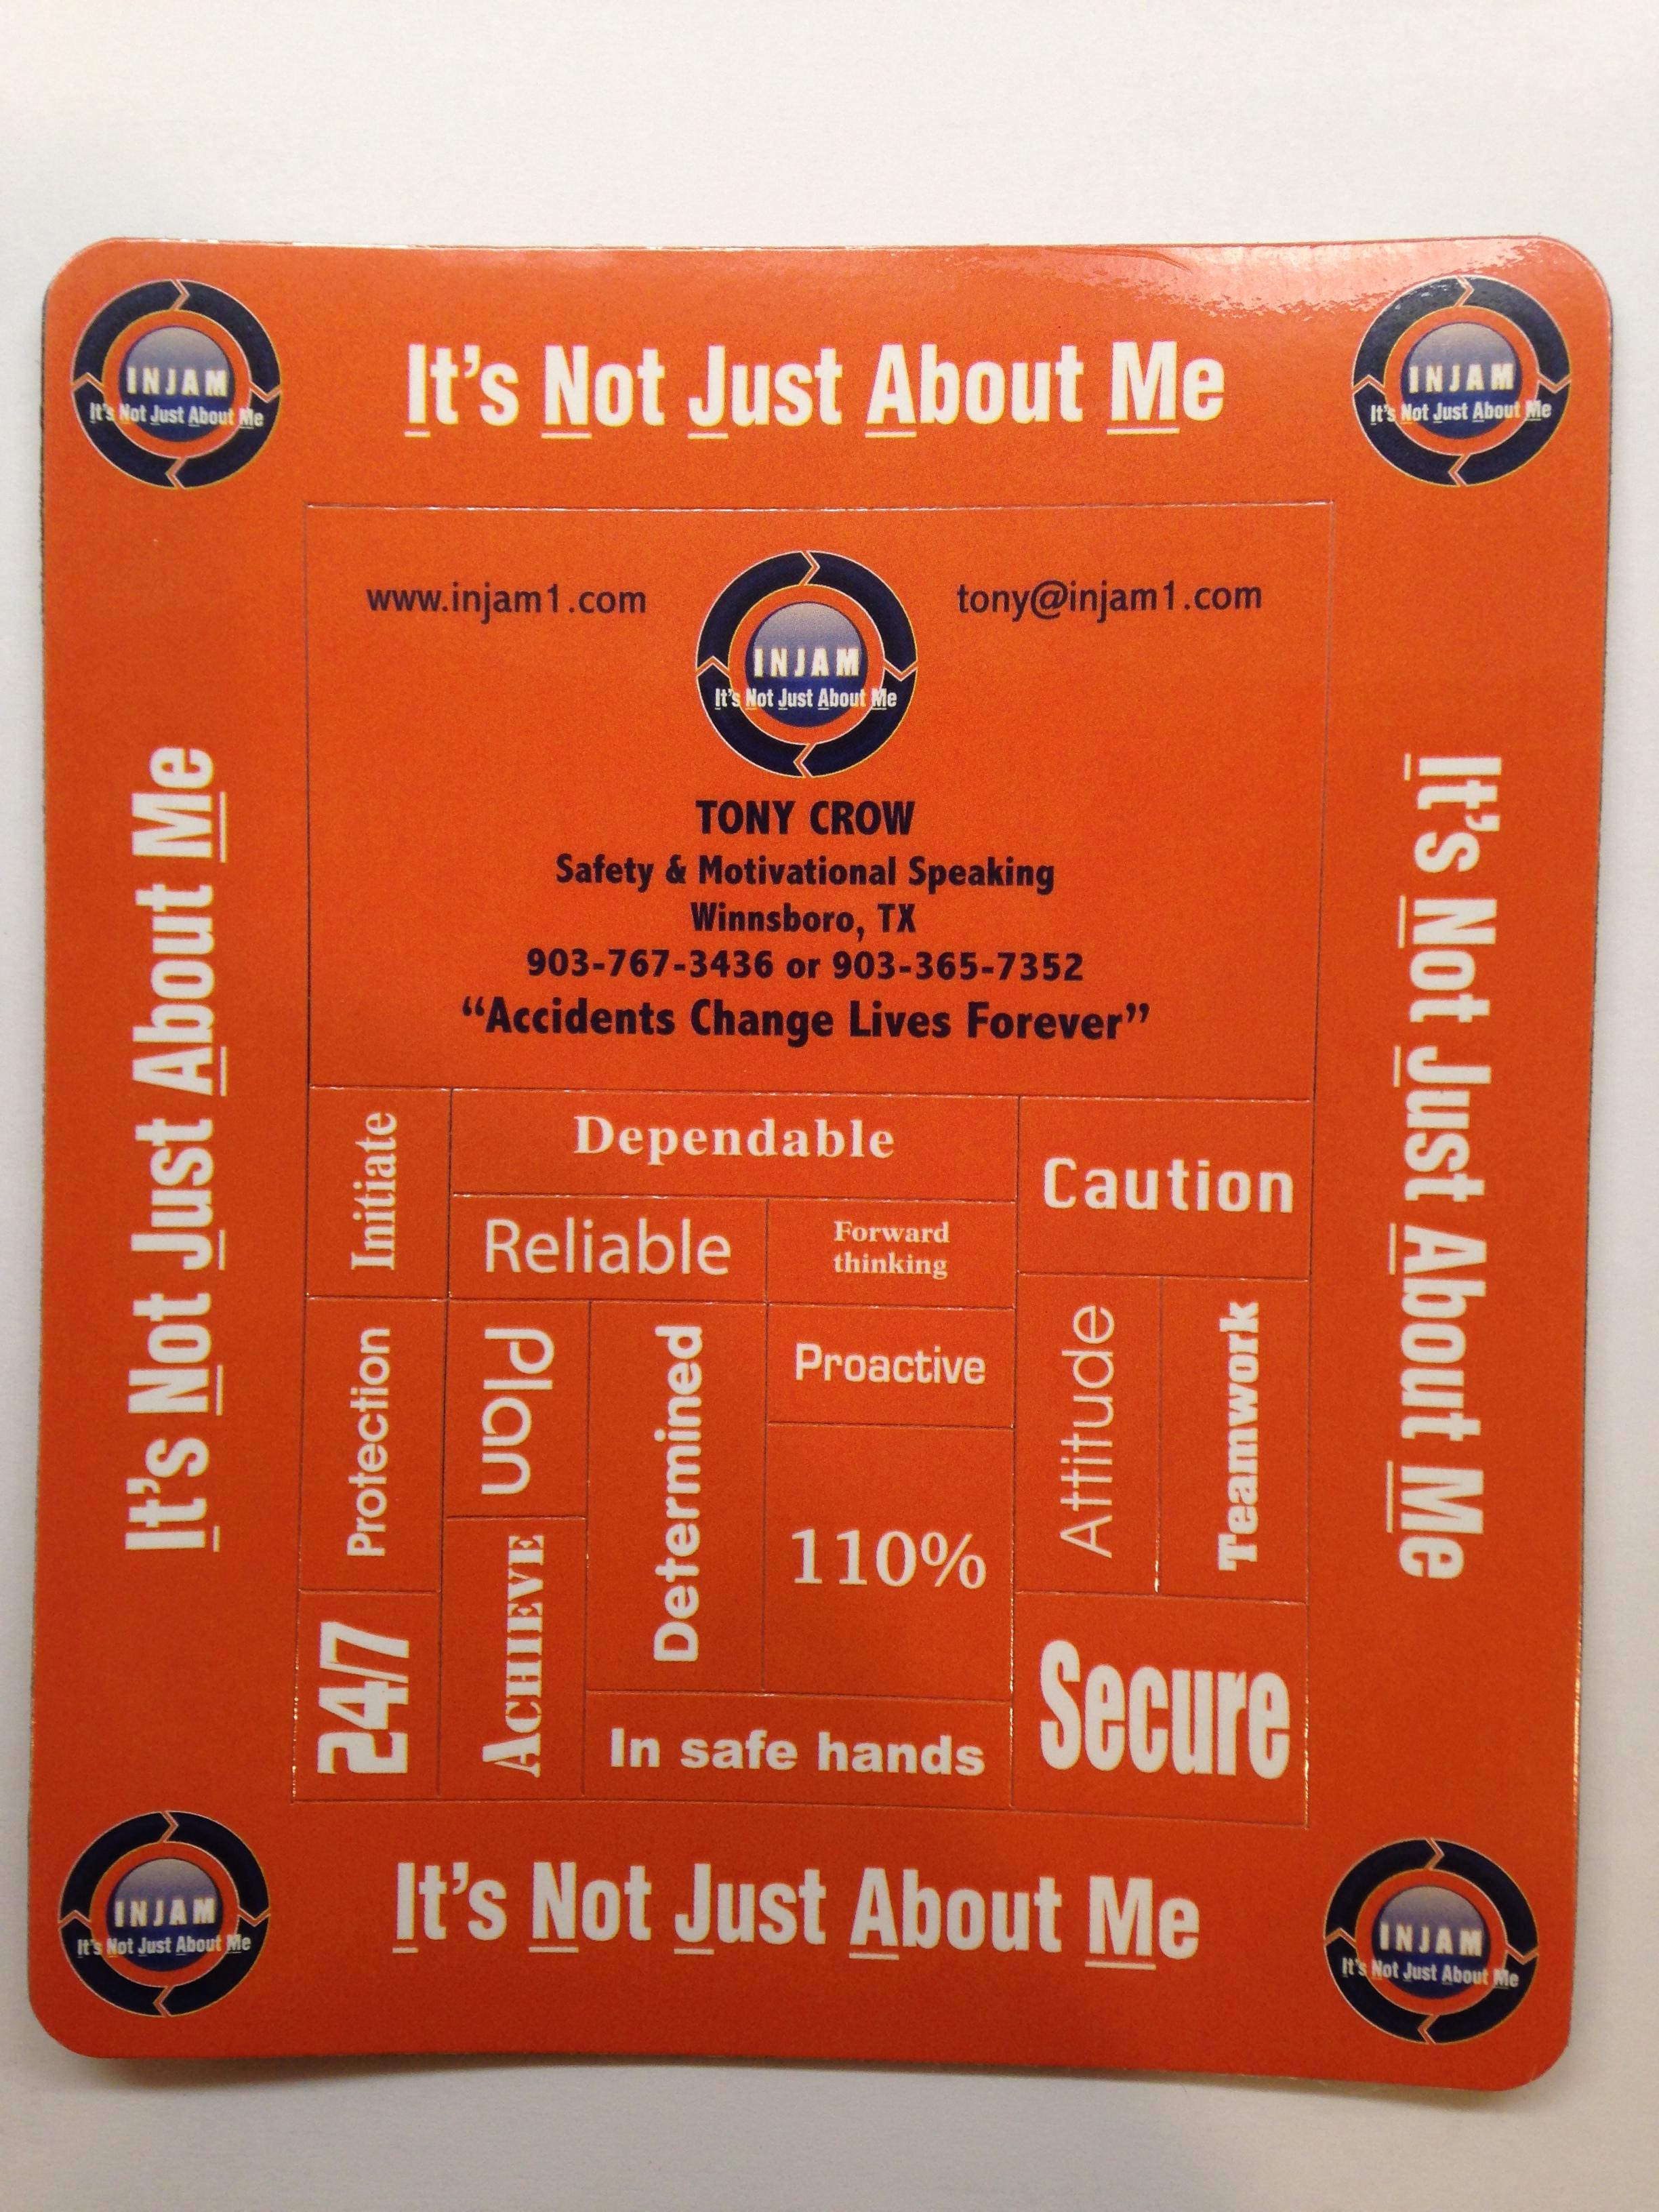 INJAM Magnetic business card & word art - INJAM